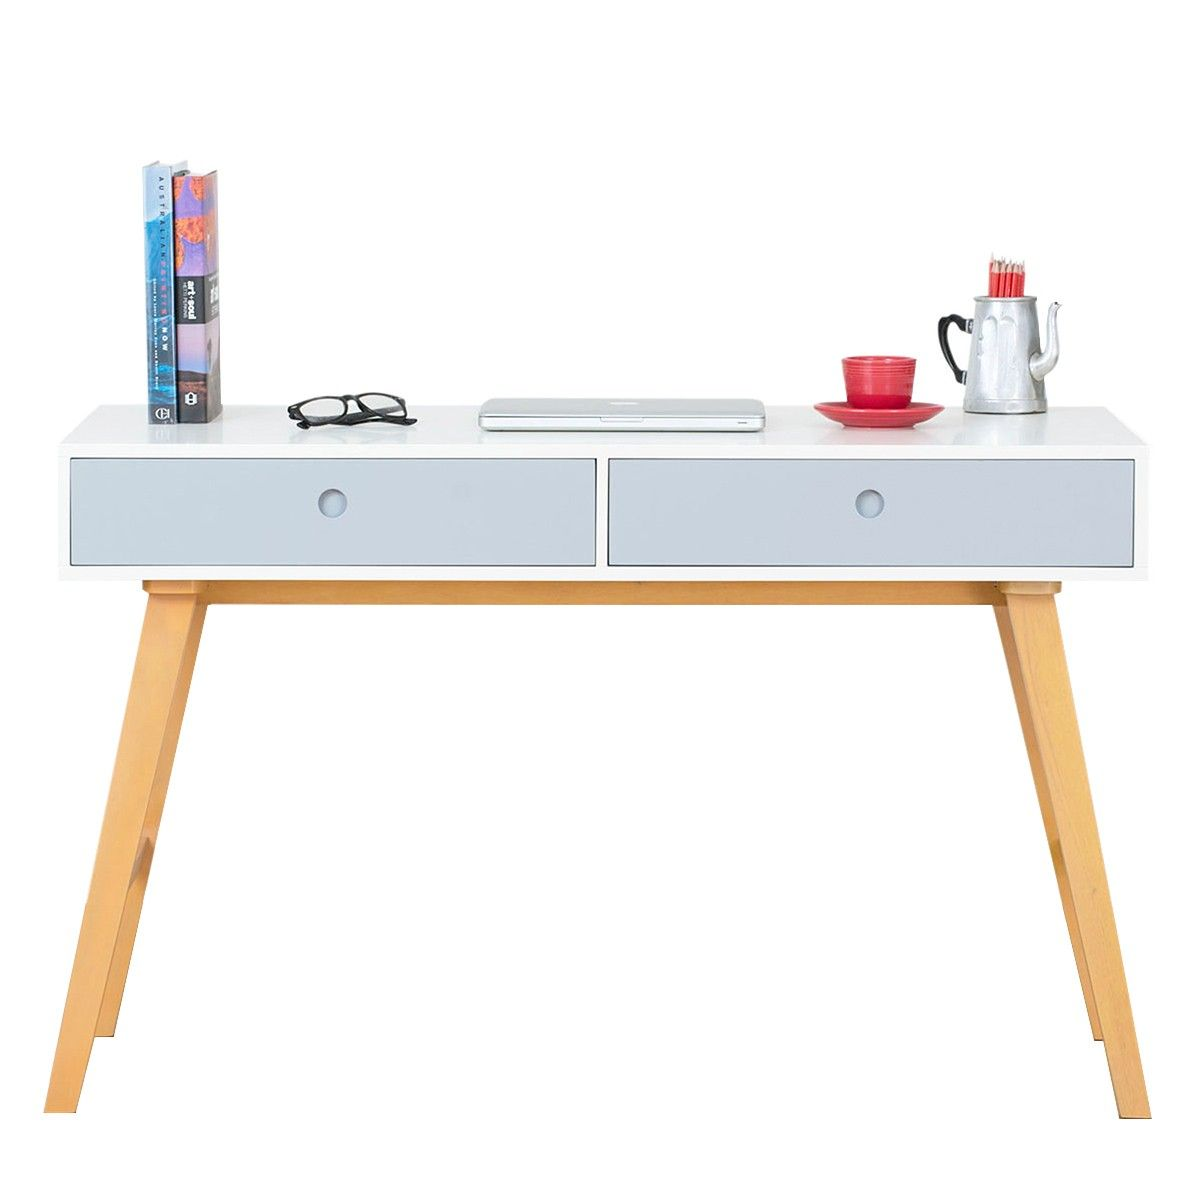 Countess Scandinavian Office Desk White Blue Scandinavian Furniture Style White Desk Office Office Desk Desk